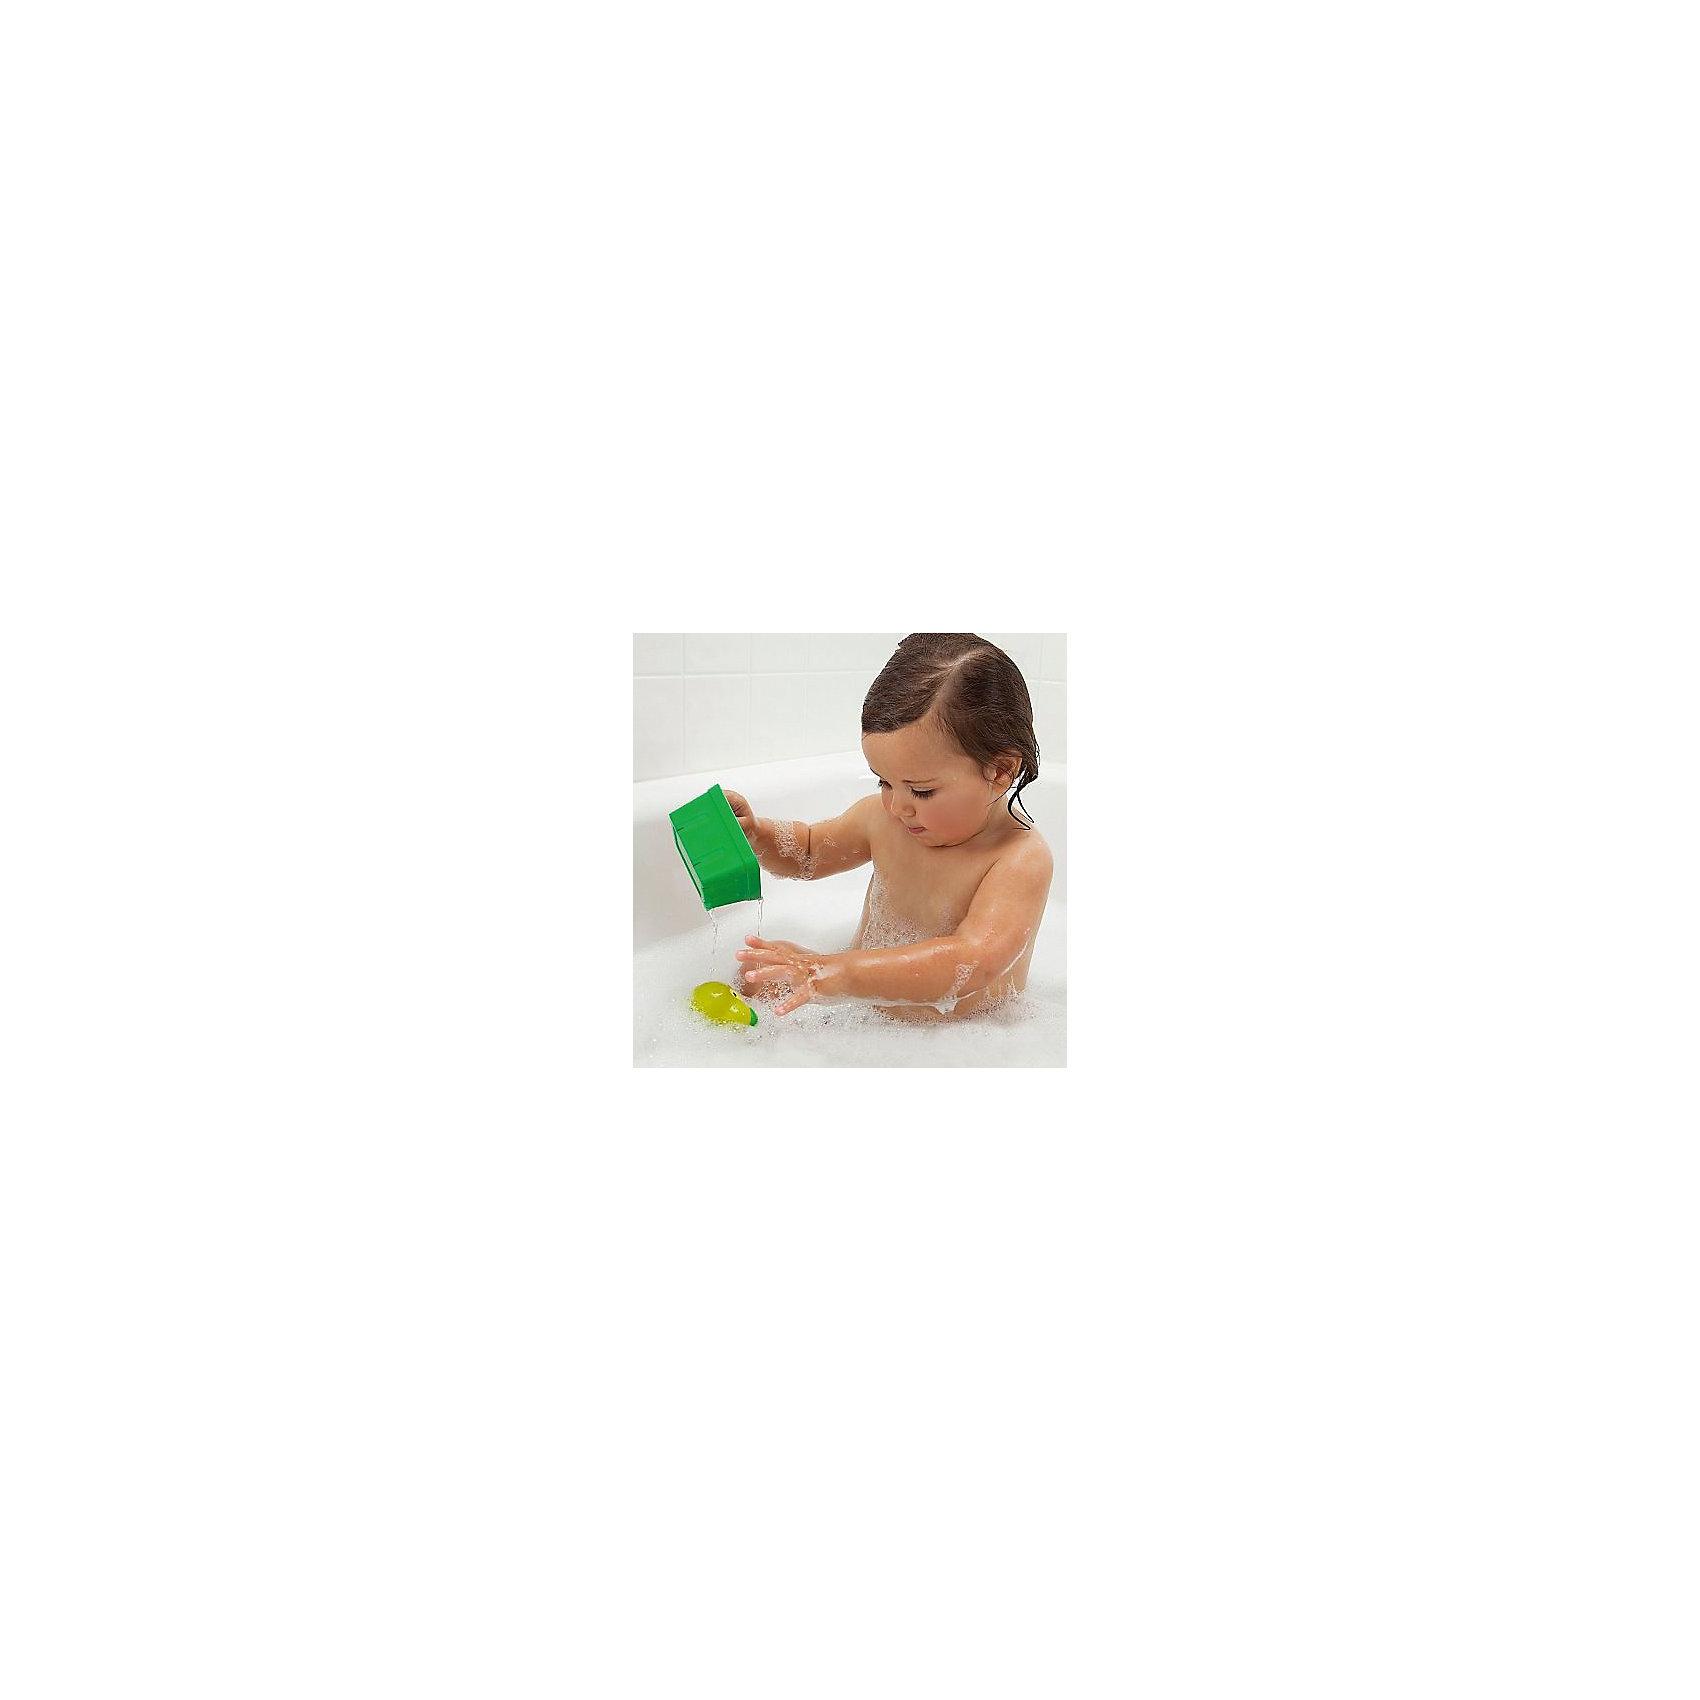 Игрушки для ванны Фрукты в корзине 9+, Munchkin (munchkin)